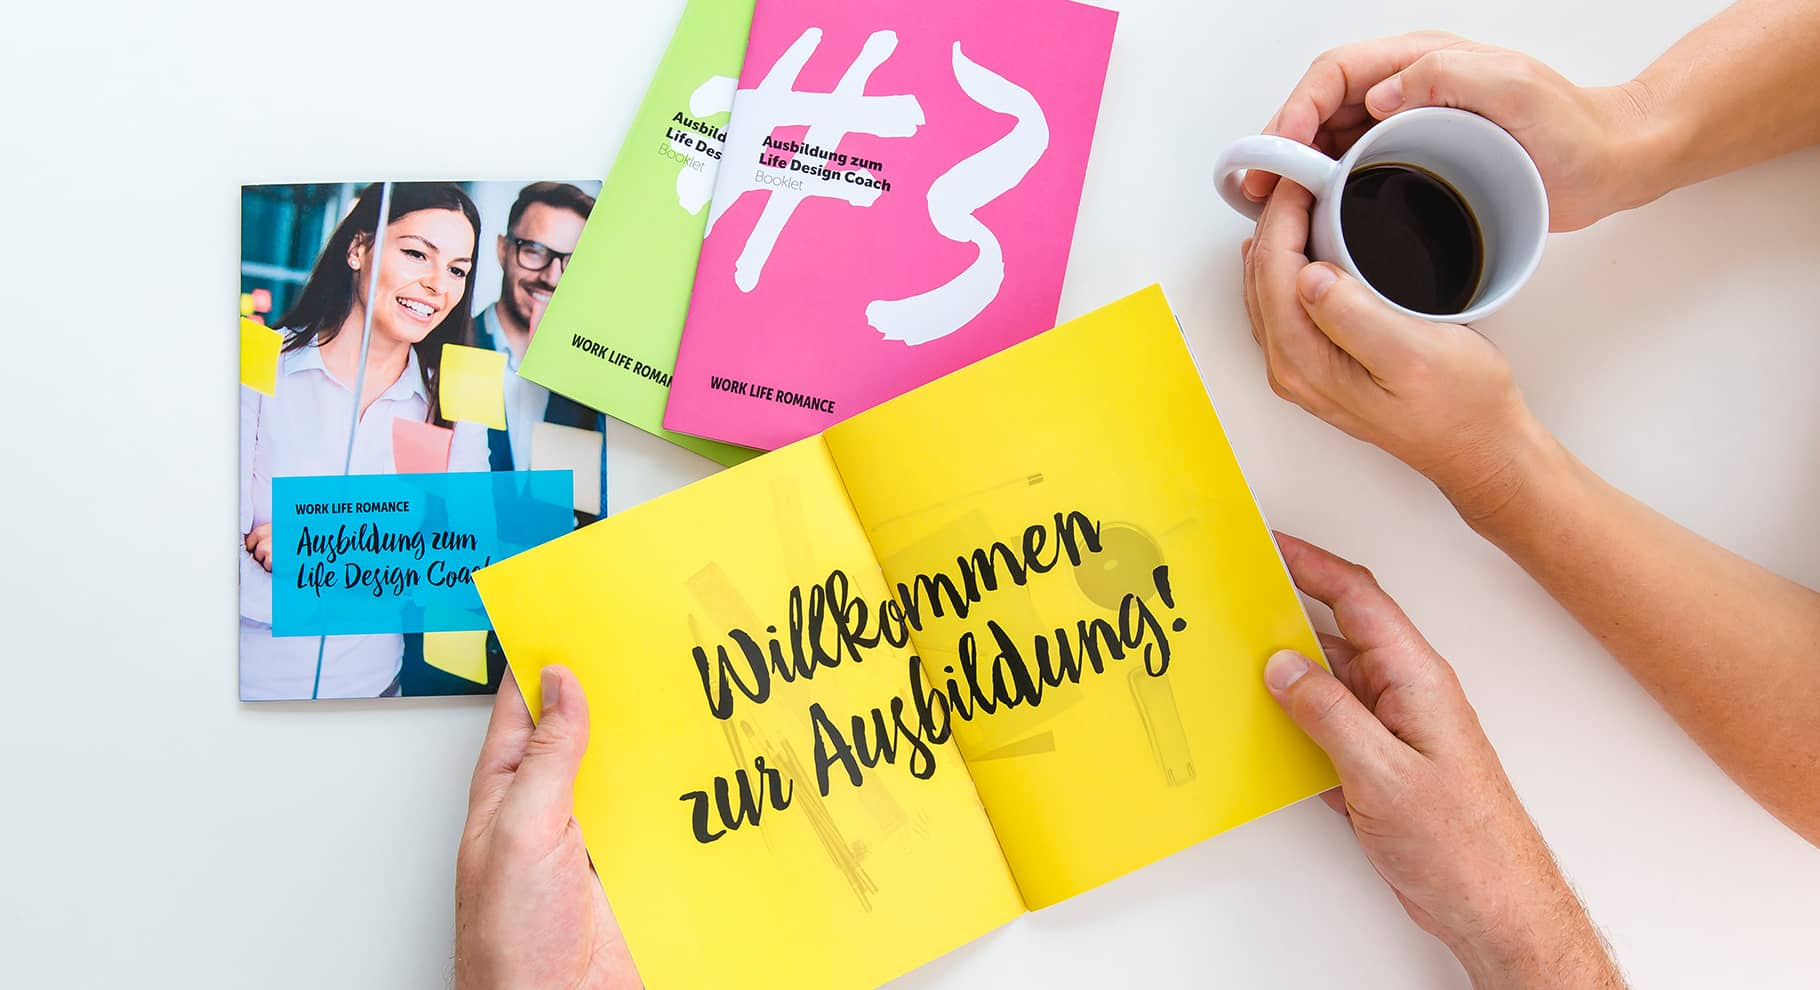 Broschüre - Life Design Coach